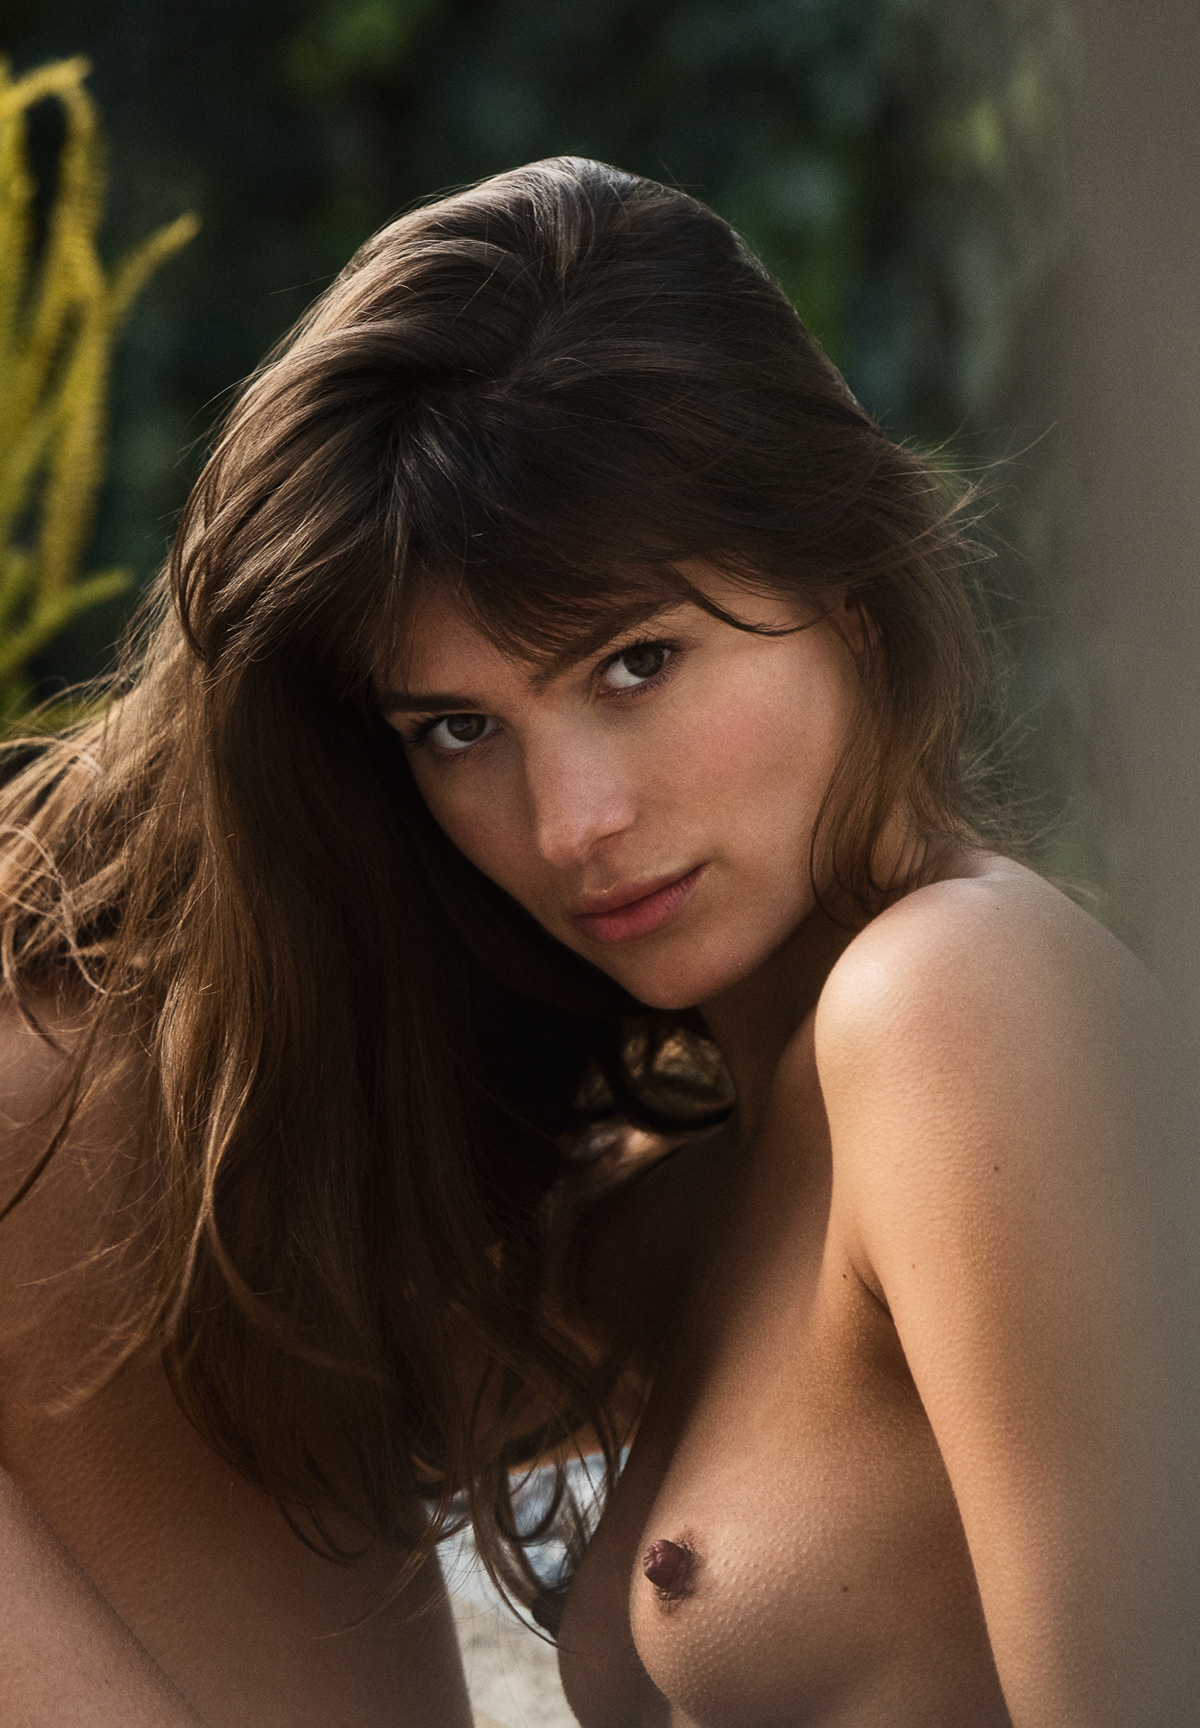 Christine Gischler for Playboy Italy / фотограф Markus Henttonen